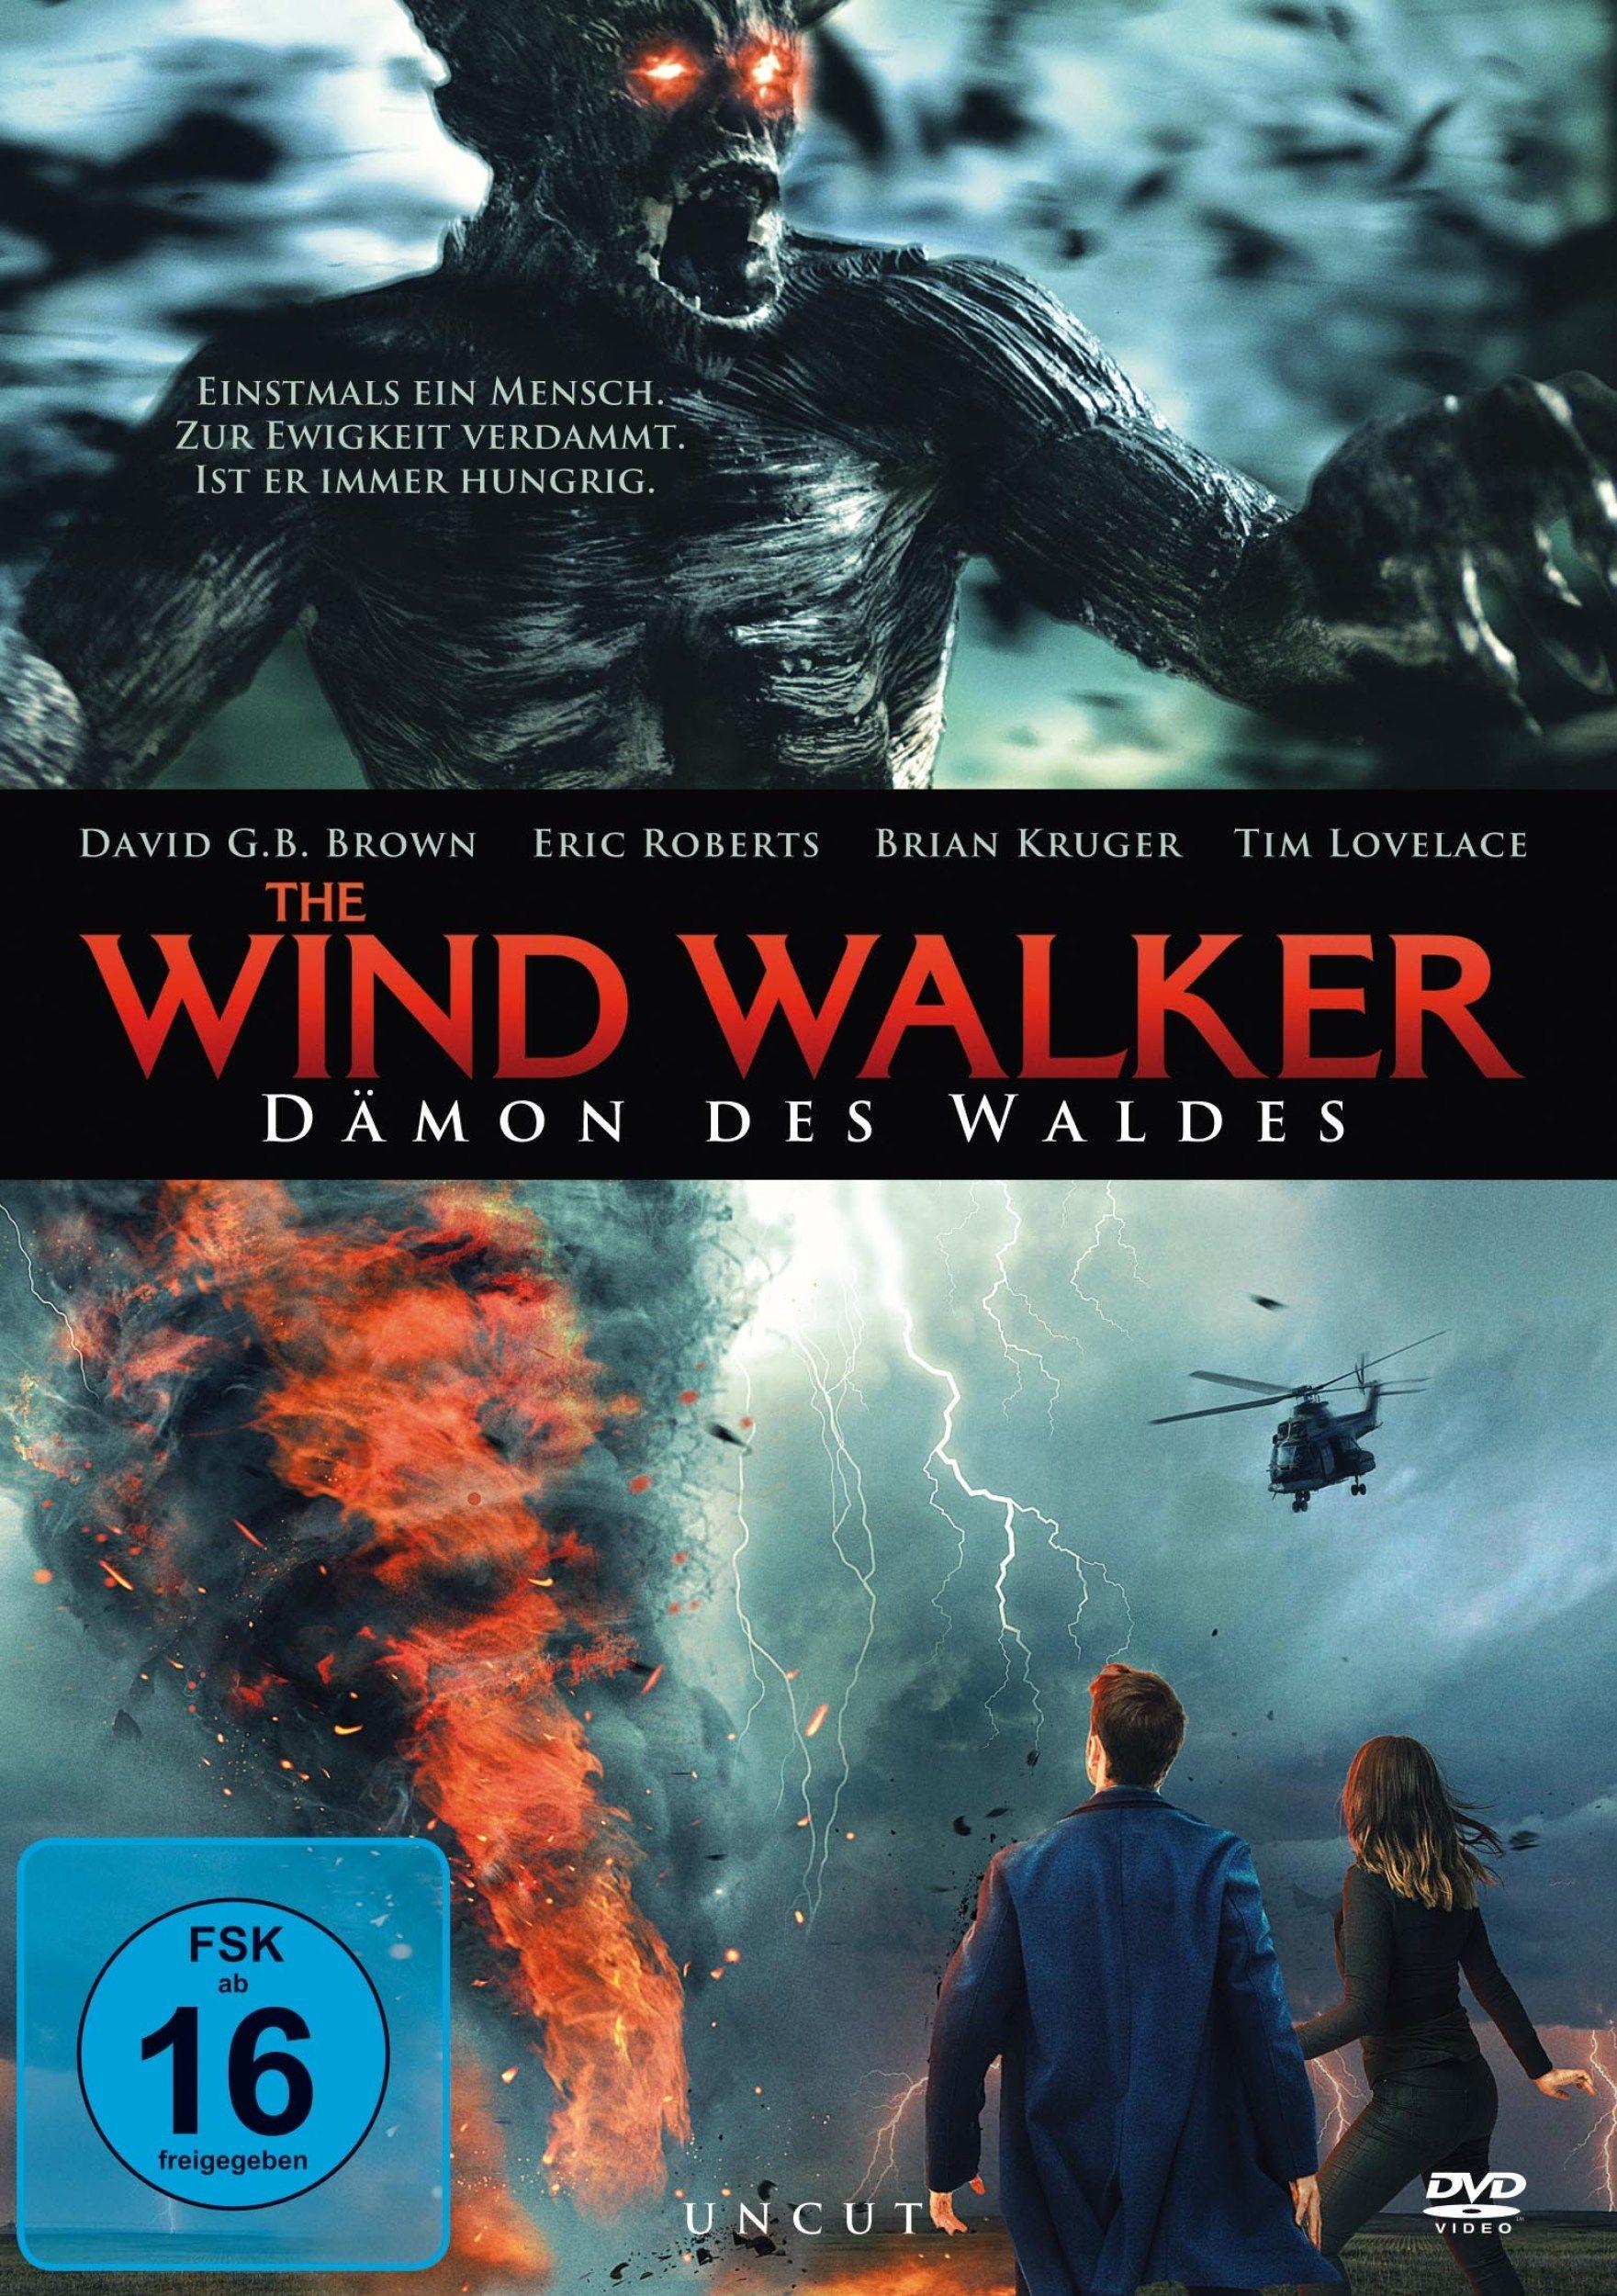 Wind Walker, The - Dämon des Waldes